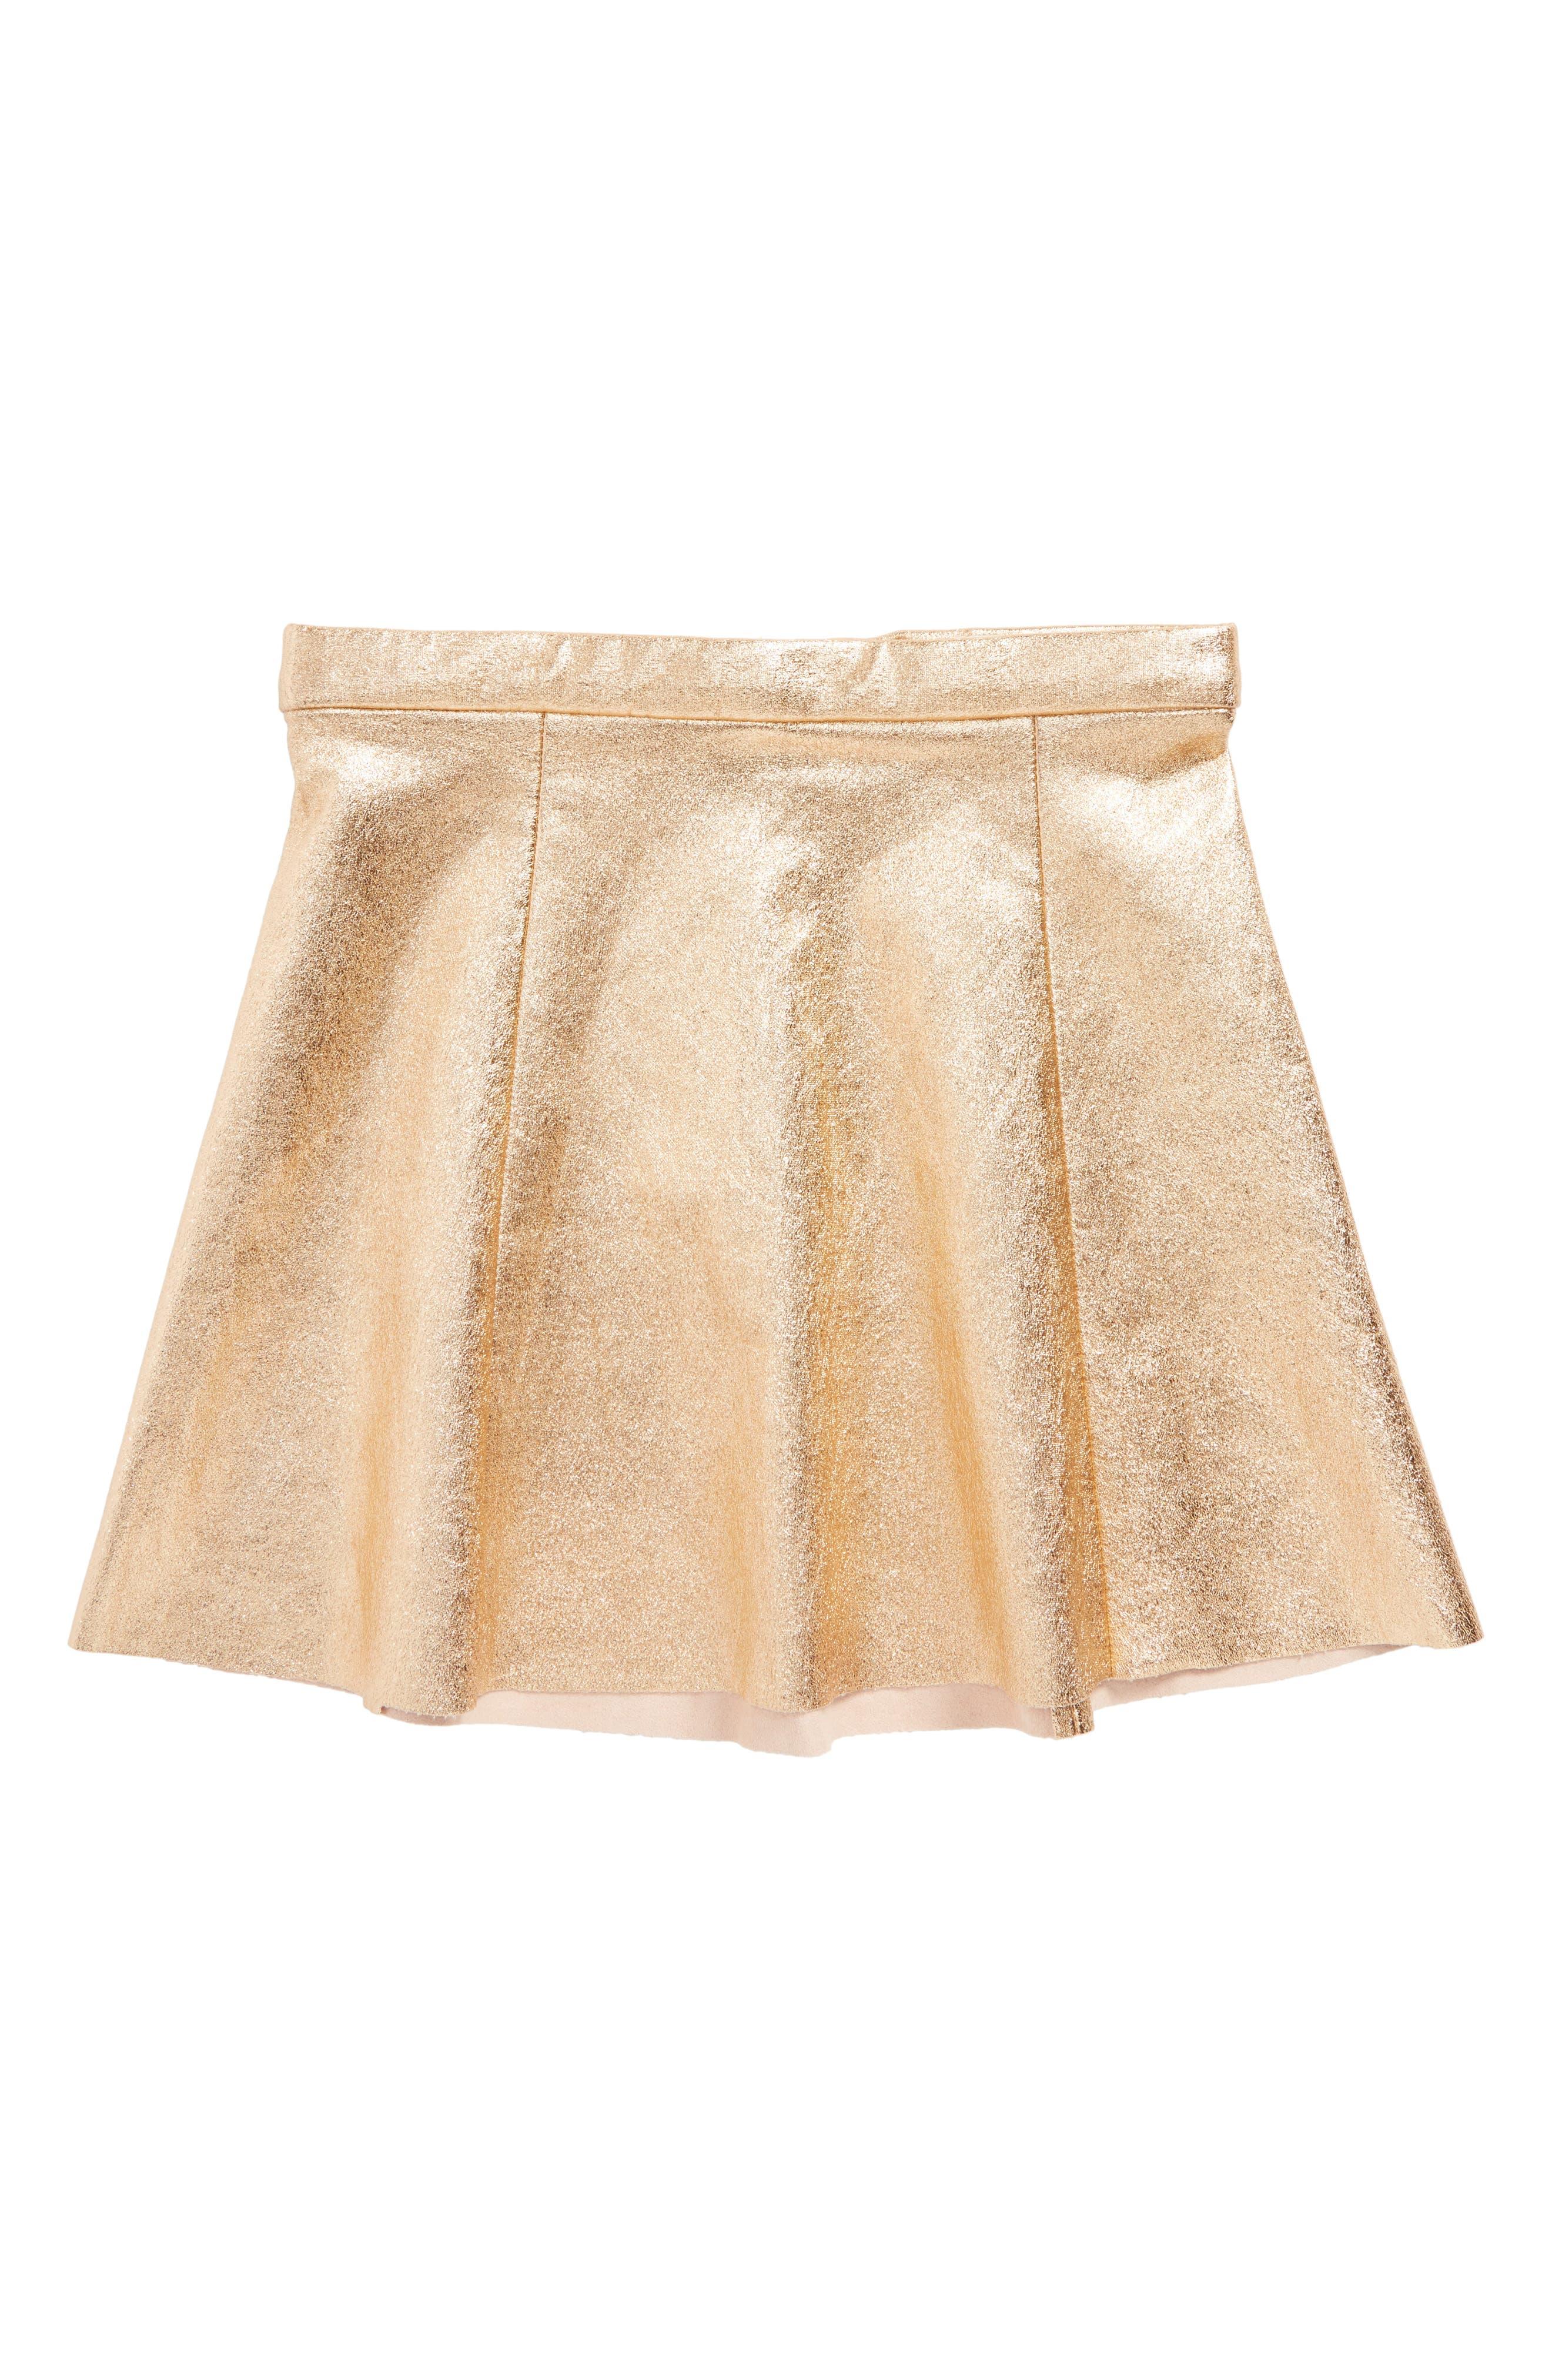 metallic skirt,                             Main thumbnail 1, color,                             Rosegold Metallic